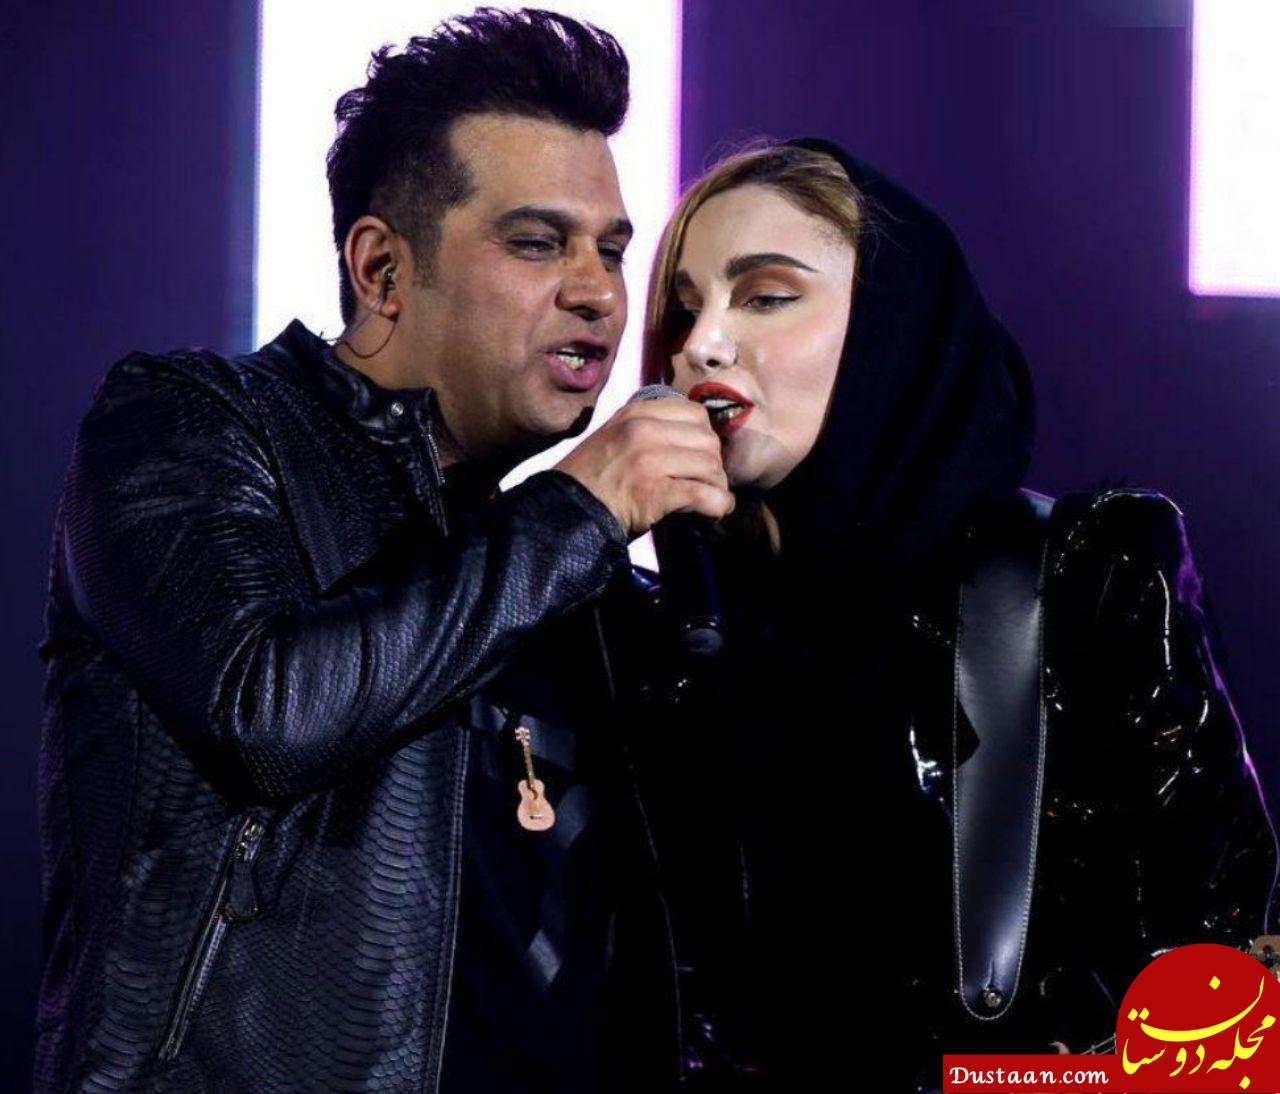 www.dustaan.com واکنش حمید عسگری به حواشی کنسرت جنجالی اش +عکس